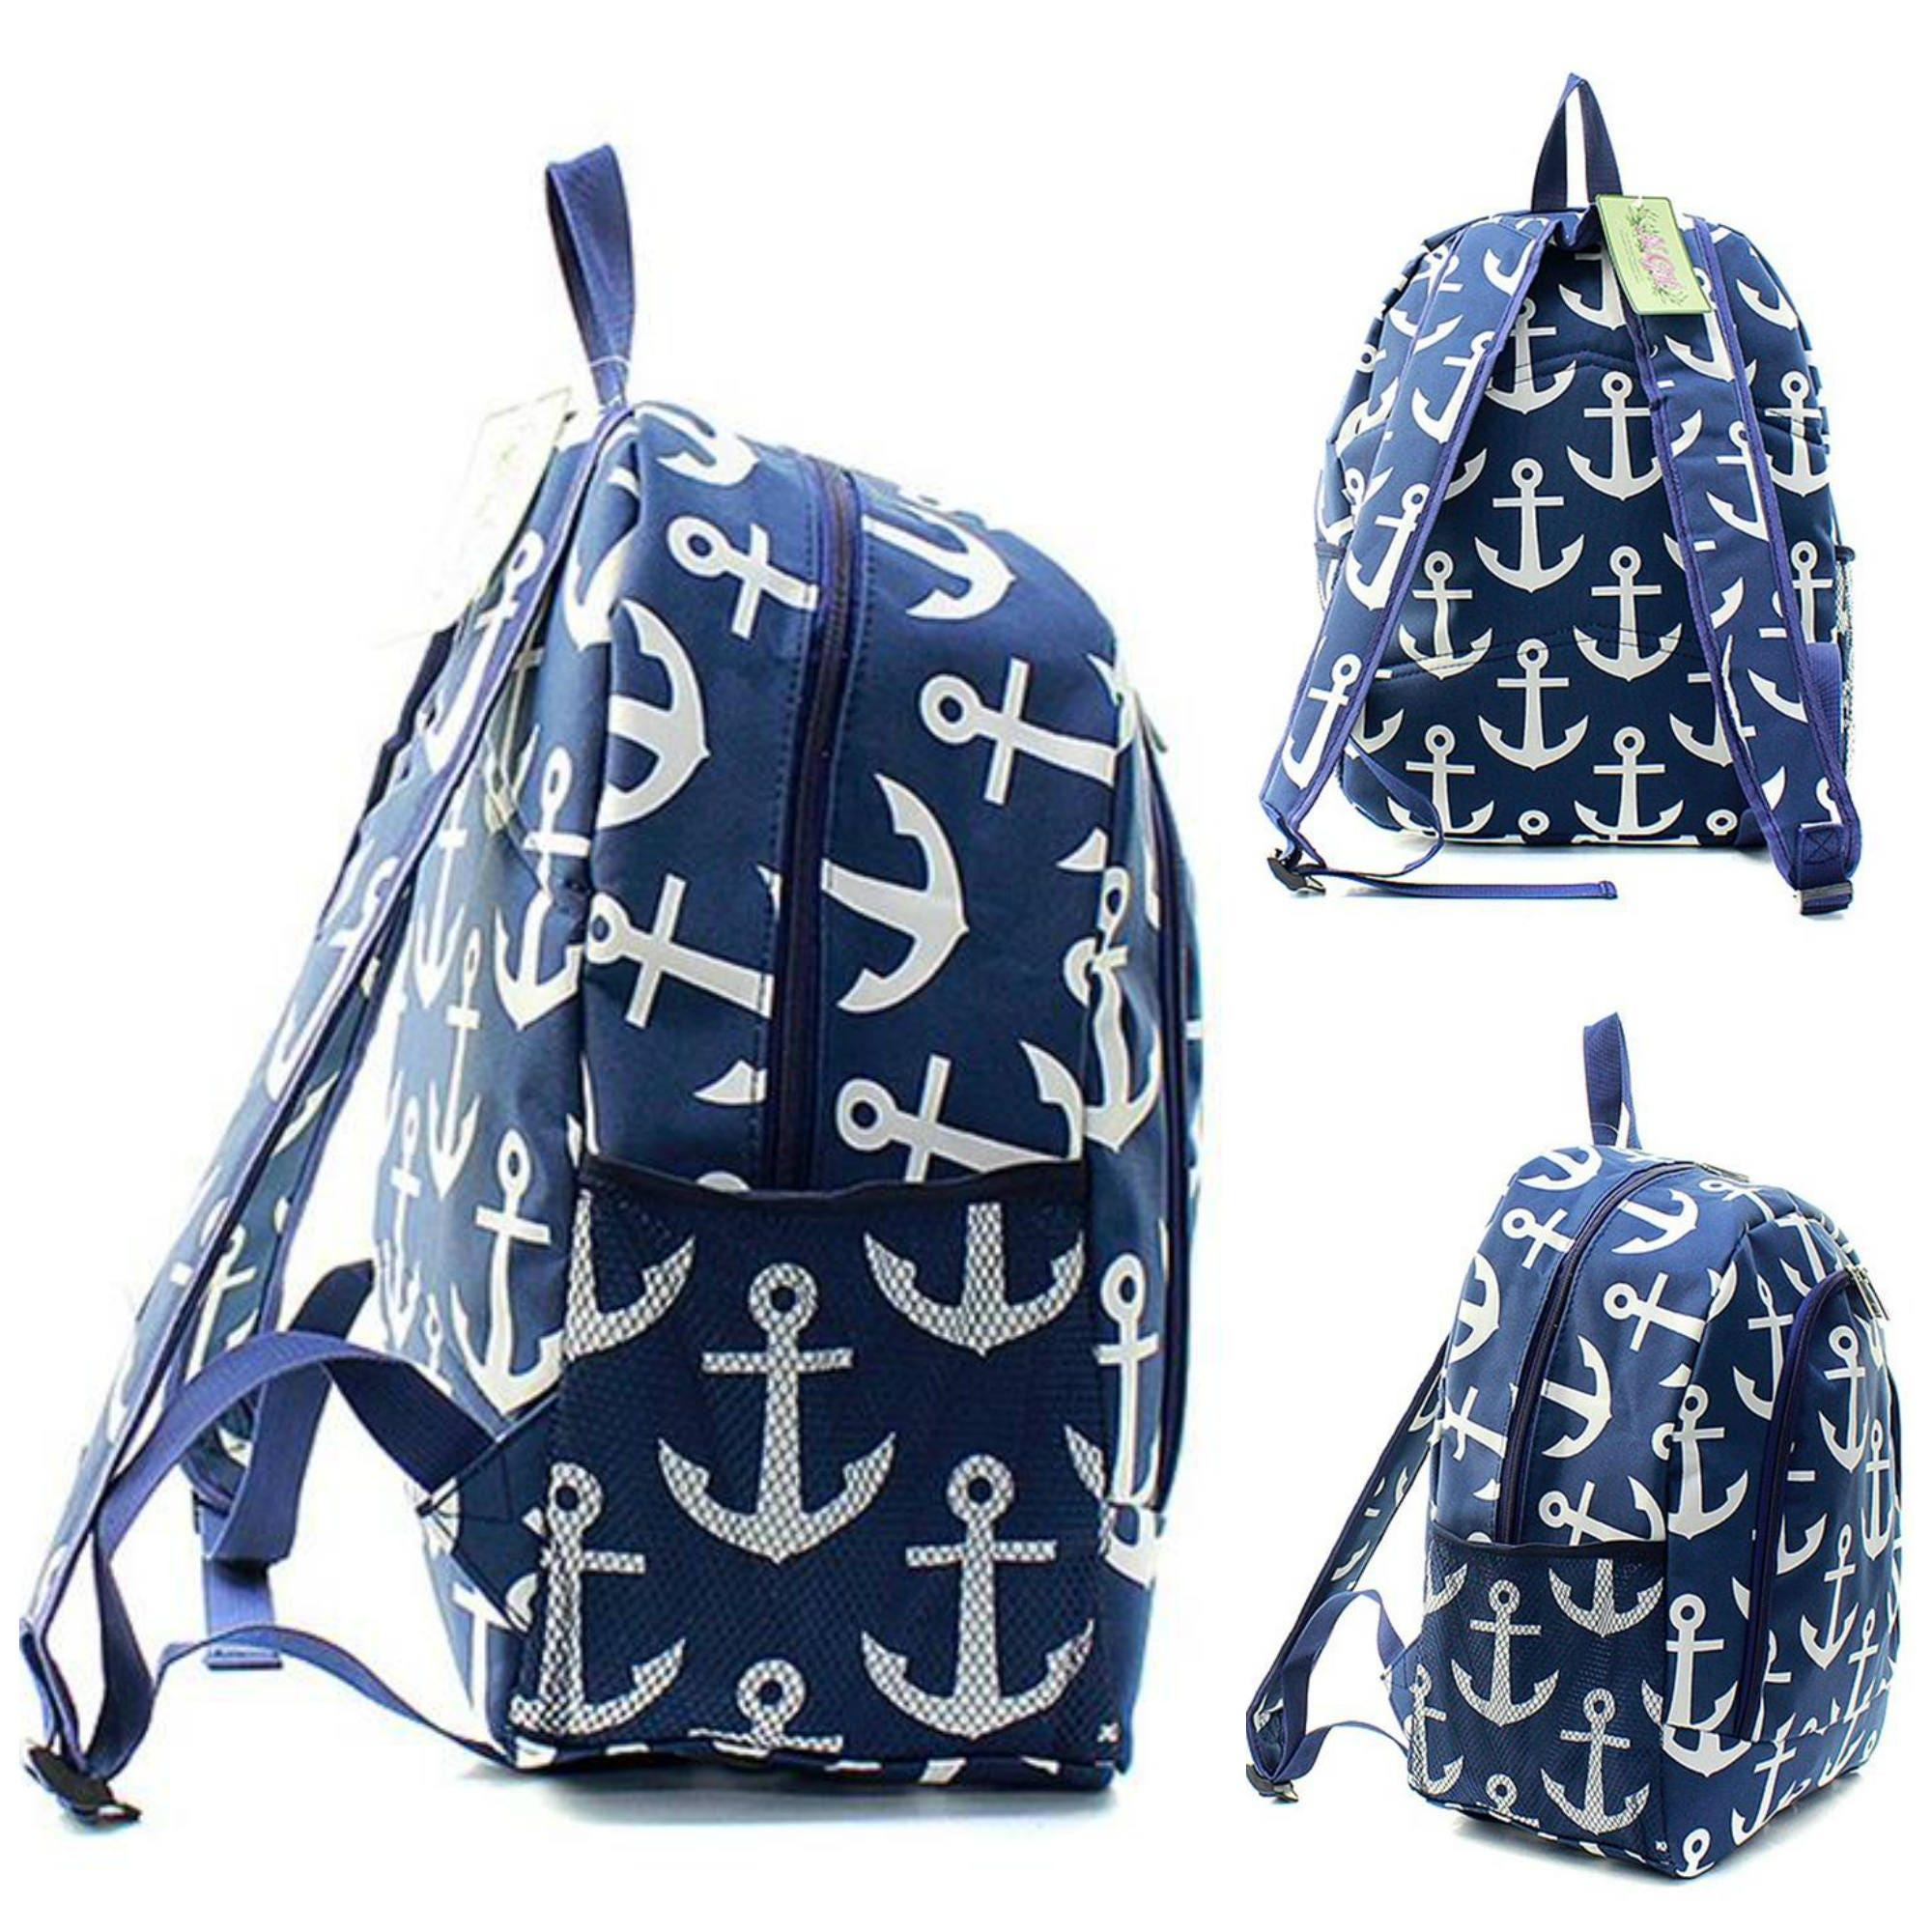 monogrammed backpack full size 17 kids bookbag book tote